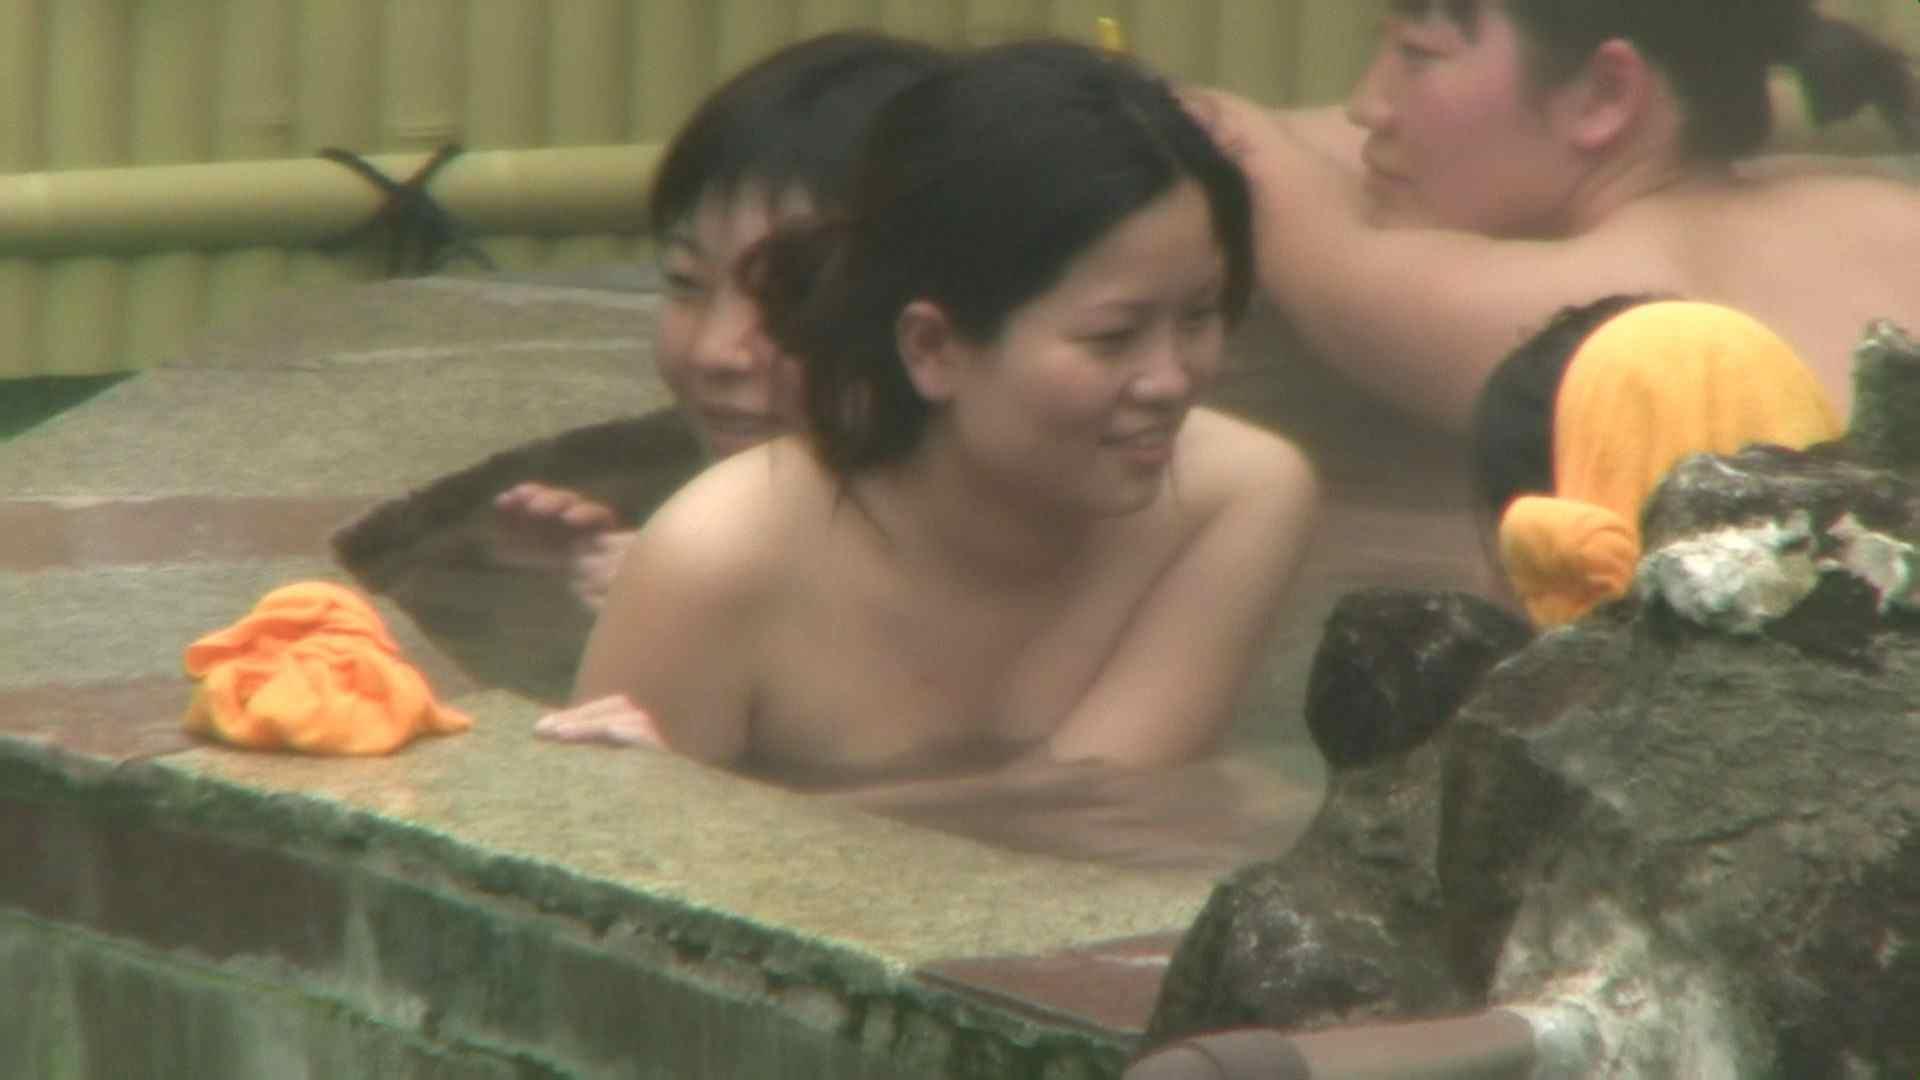 Aquaな露天風呂Vol.73【VIP限定】 盗撮 | HなOL  54pic 27